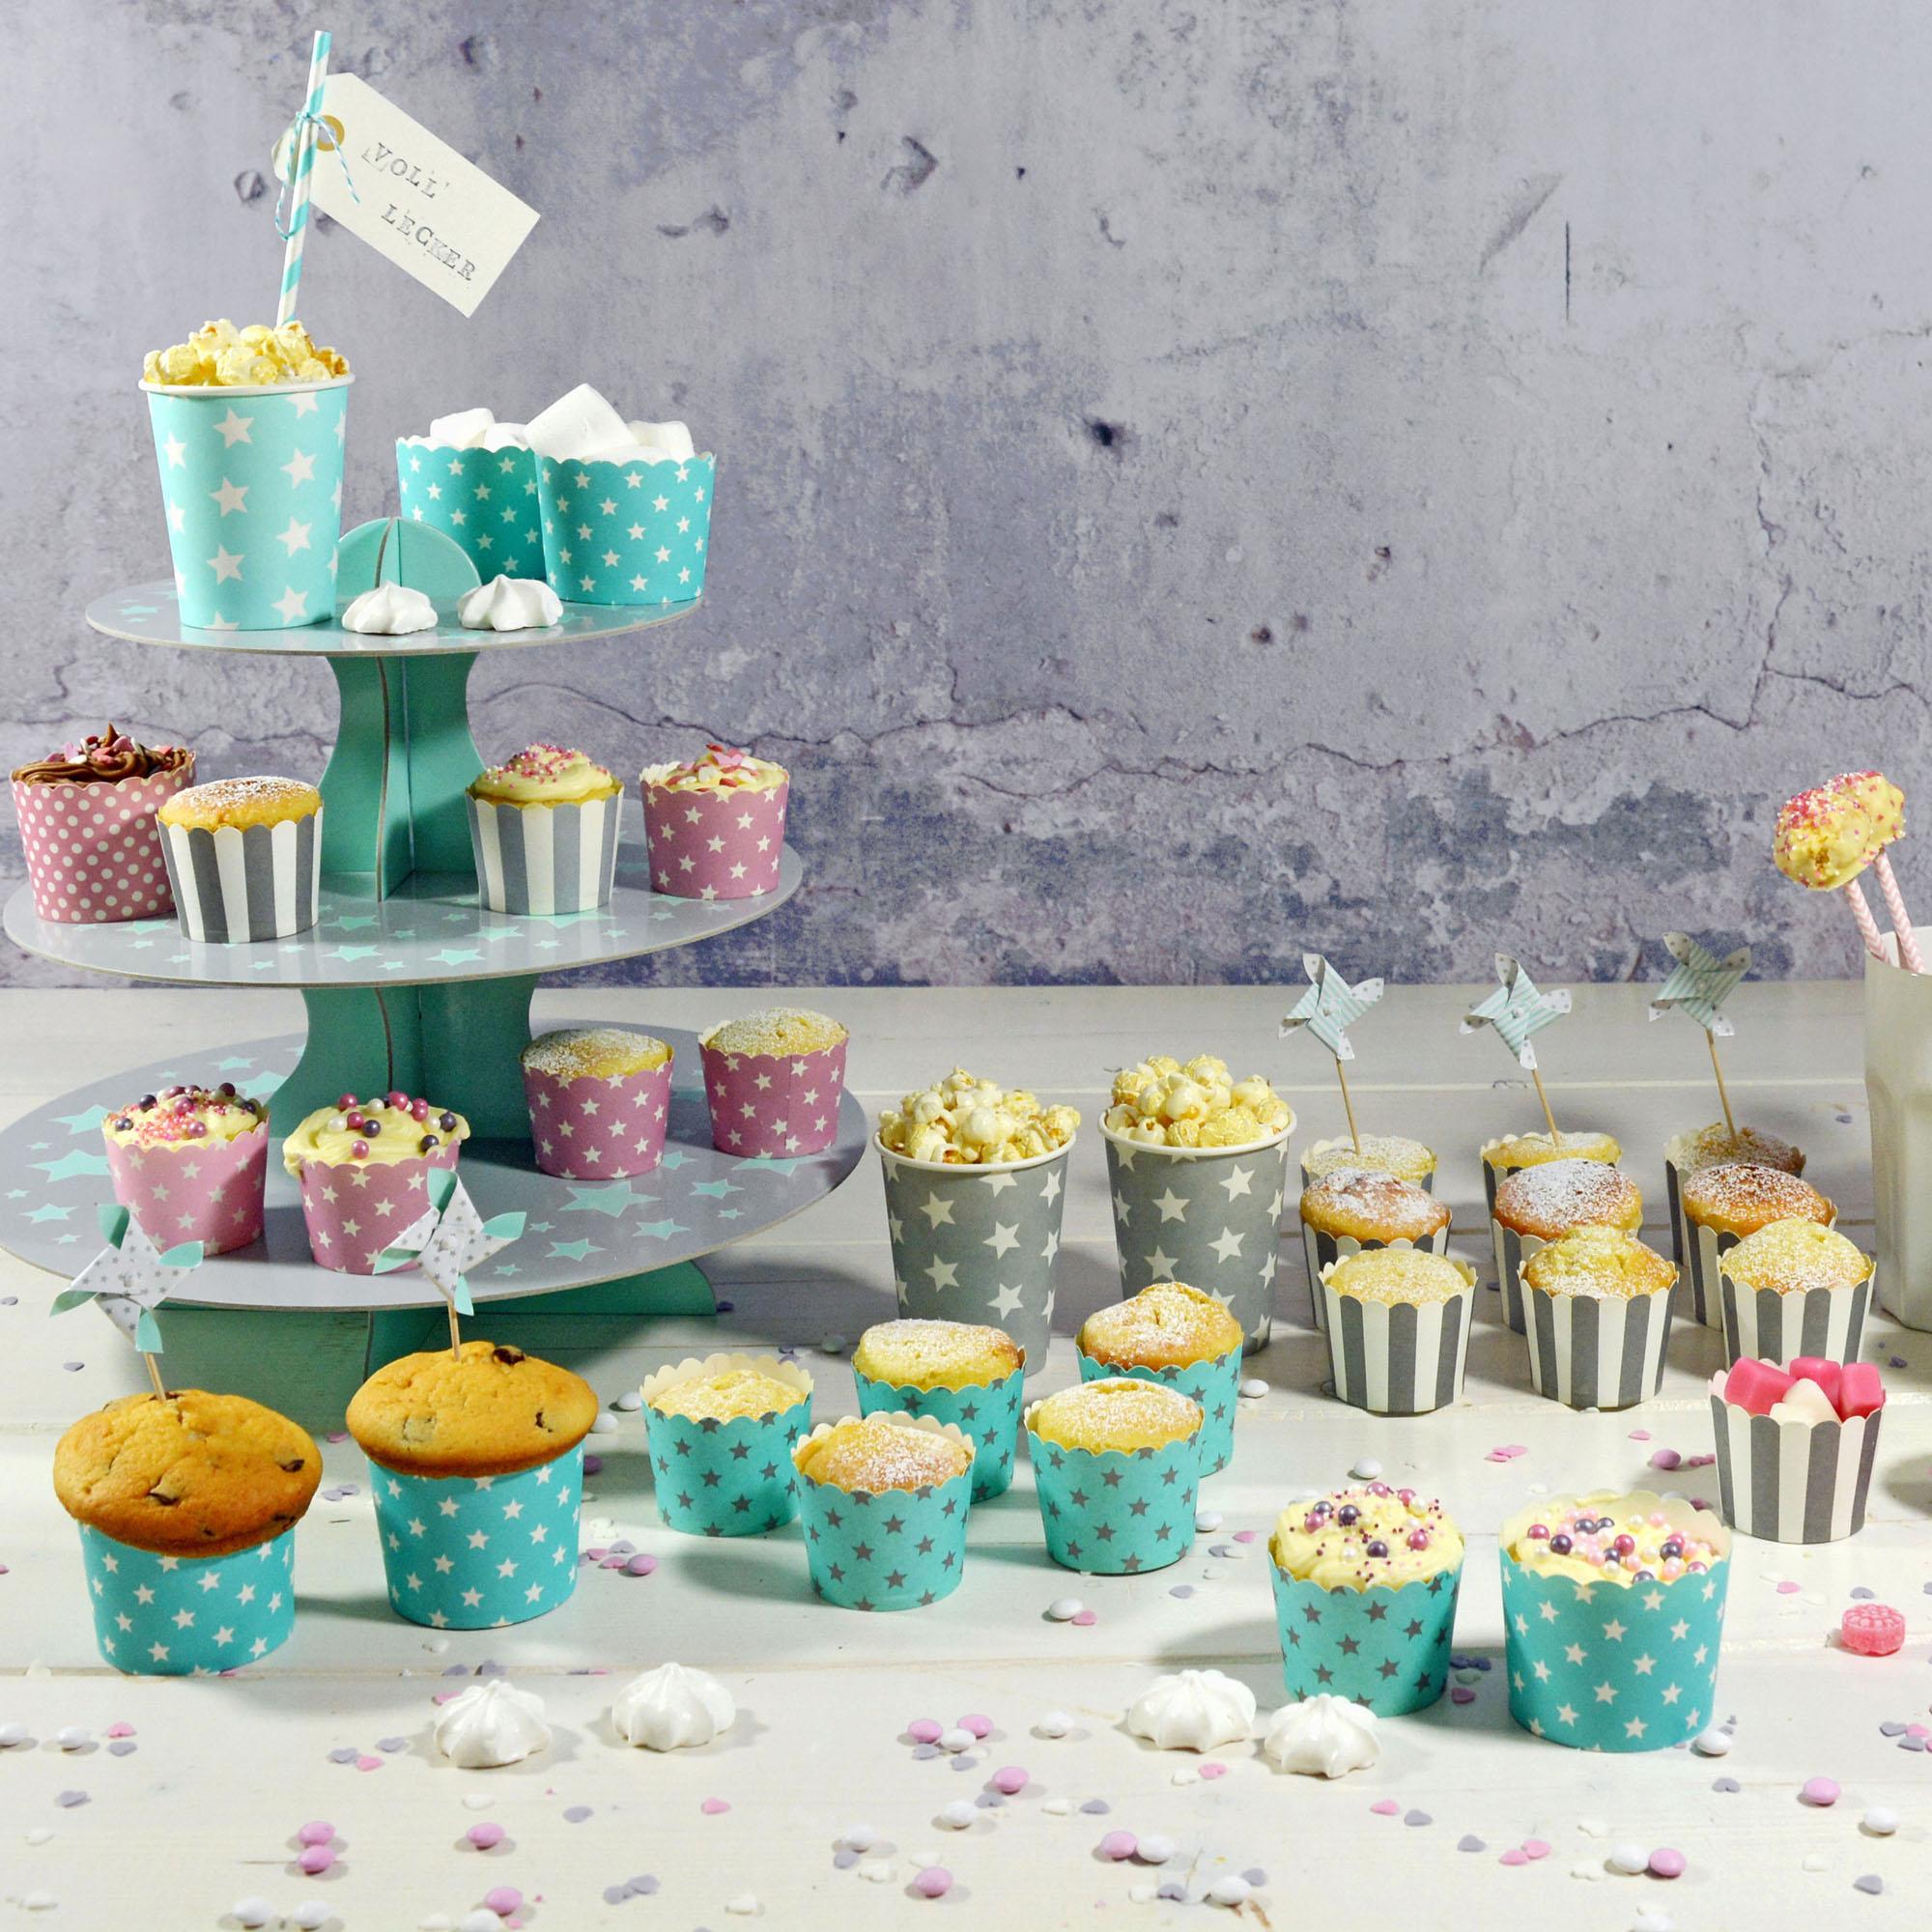 muffin cupcake kuchenstecker topper candy bar sweet table. Black Bedroom Furniture Sets. Home Design Ideas